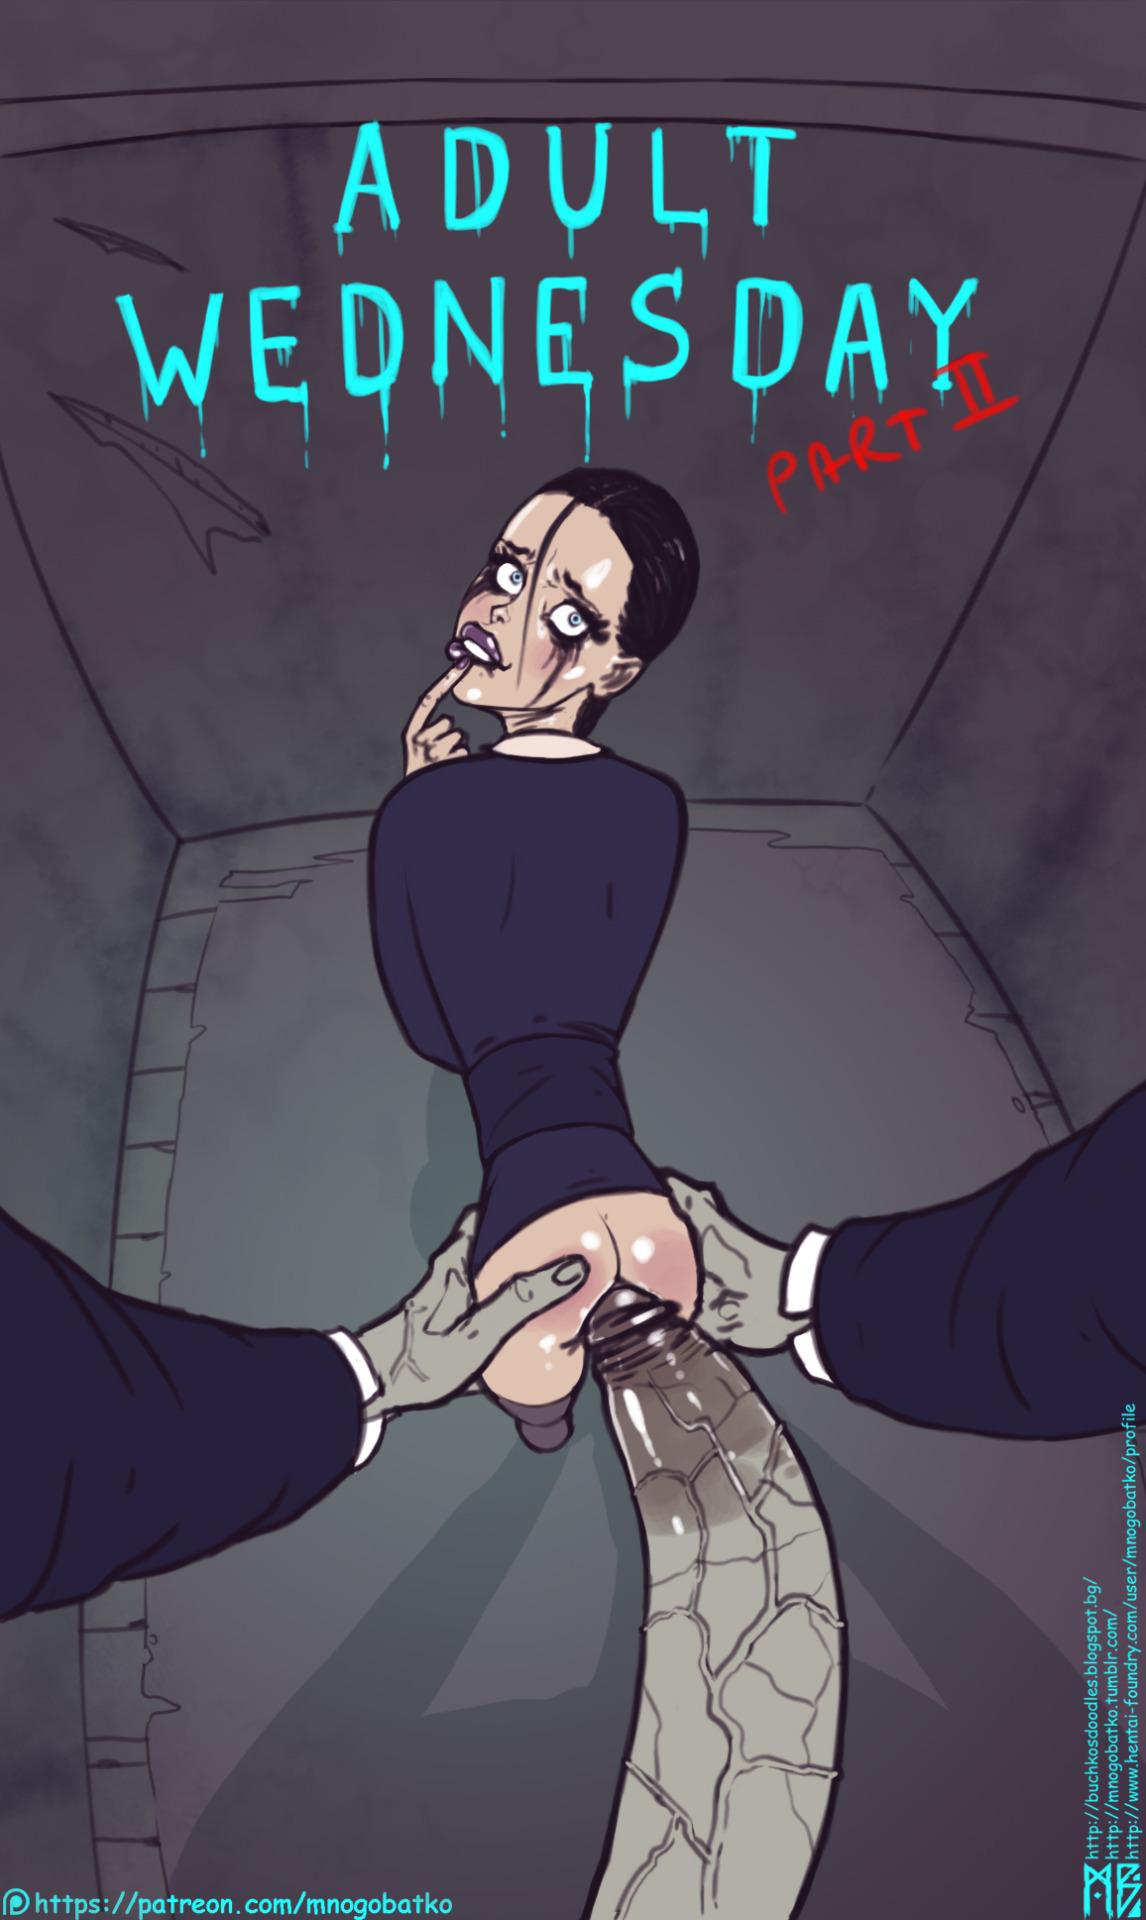 Addams Family Porn adult wednesday – the addams family [mnogobatko